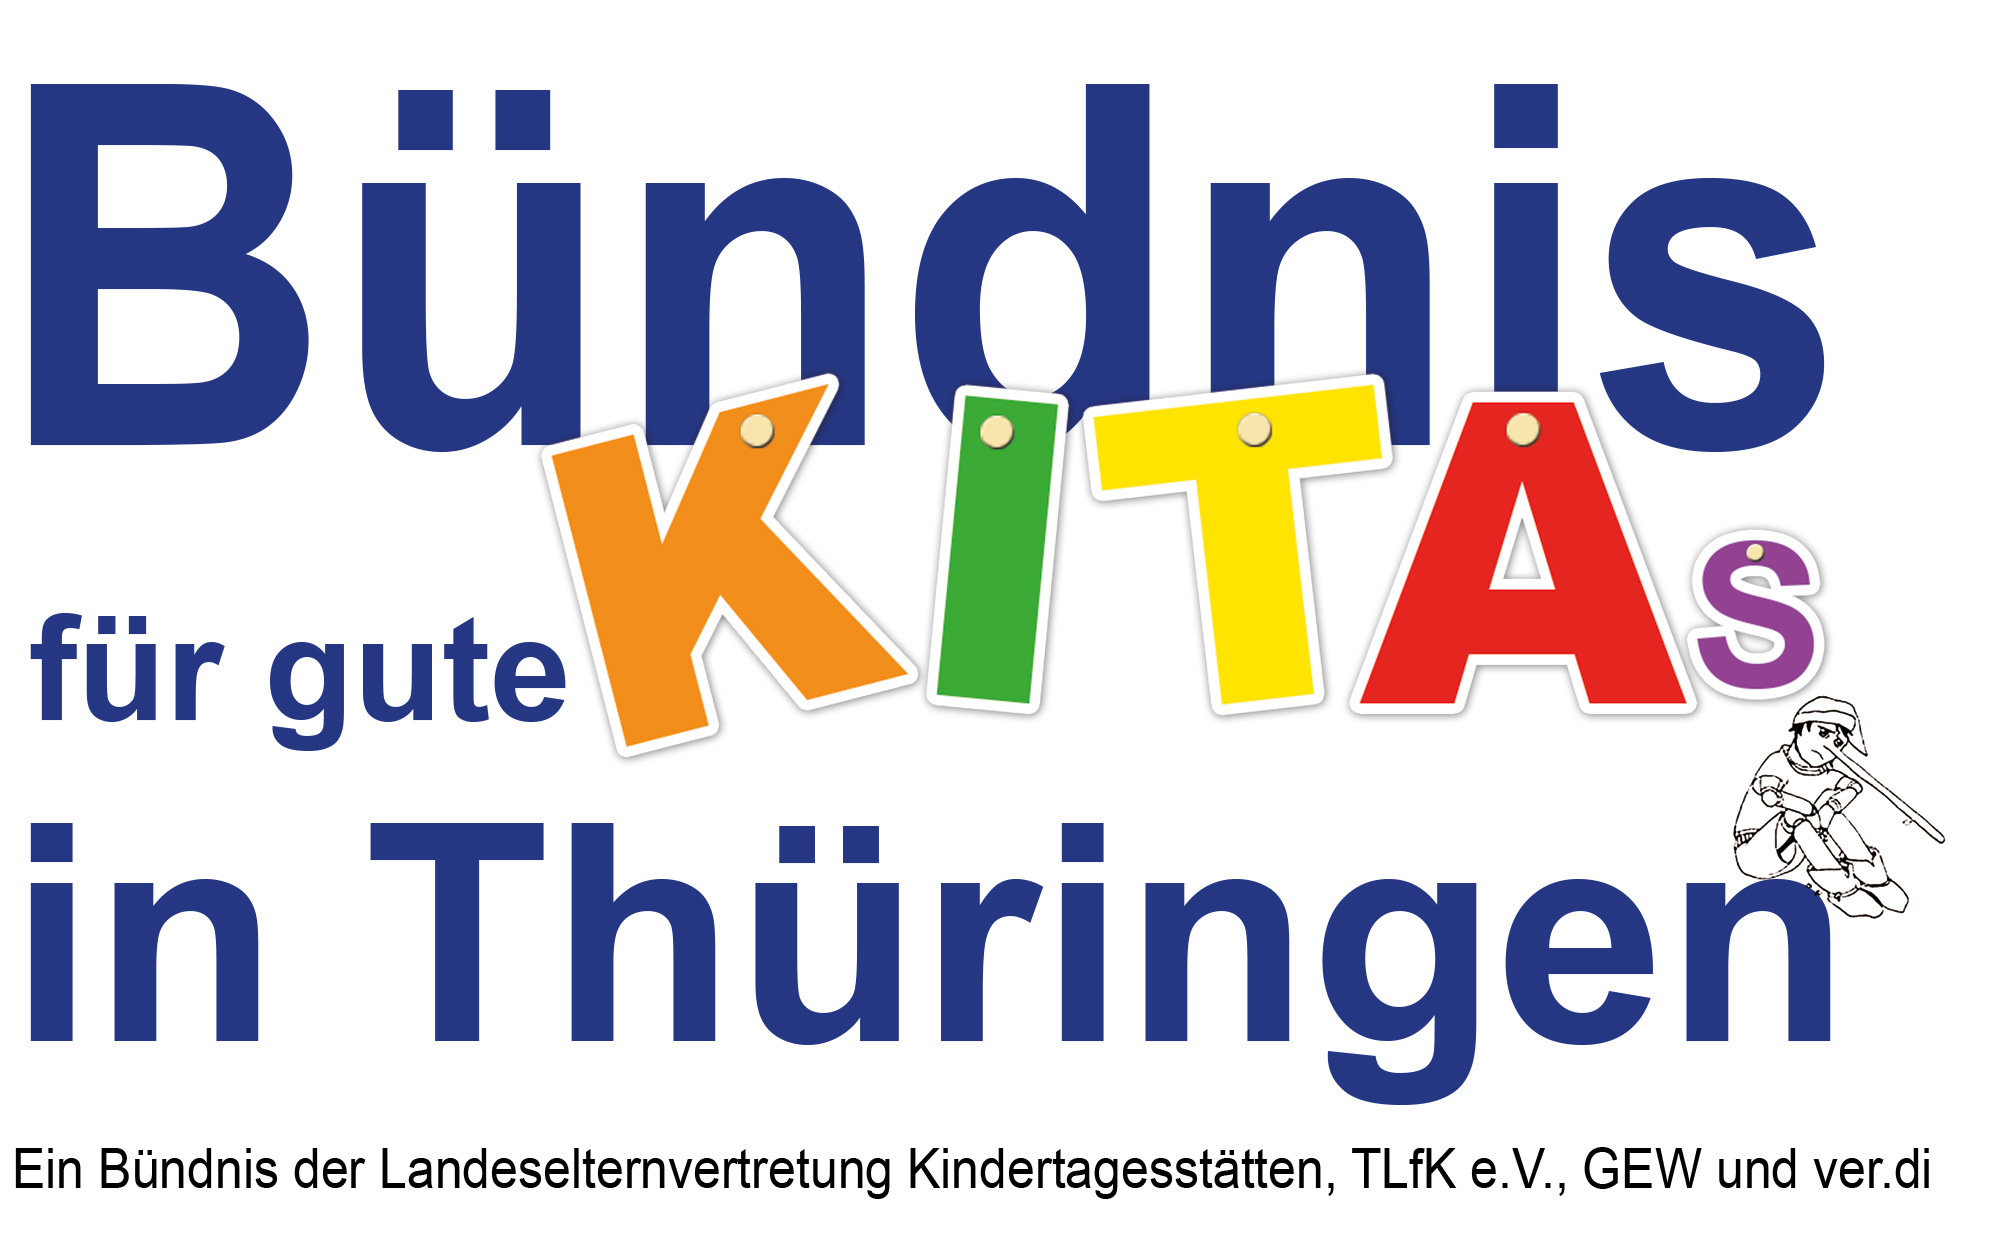 Bündnis für gute Kitas in Thüringen